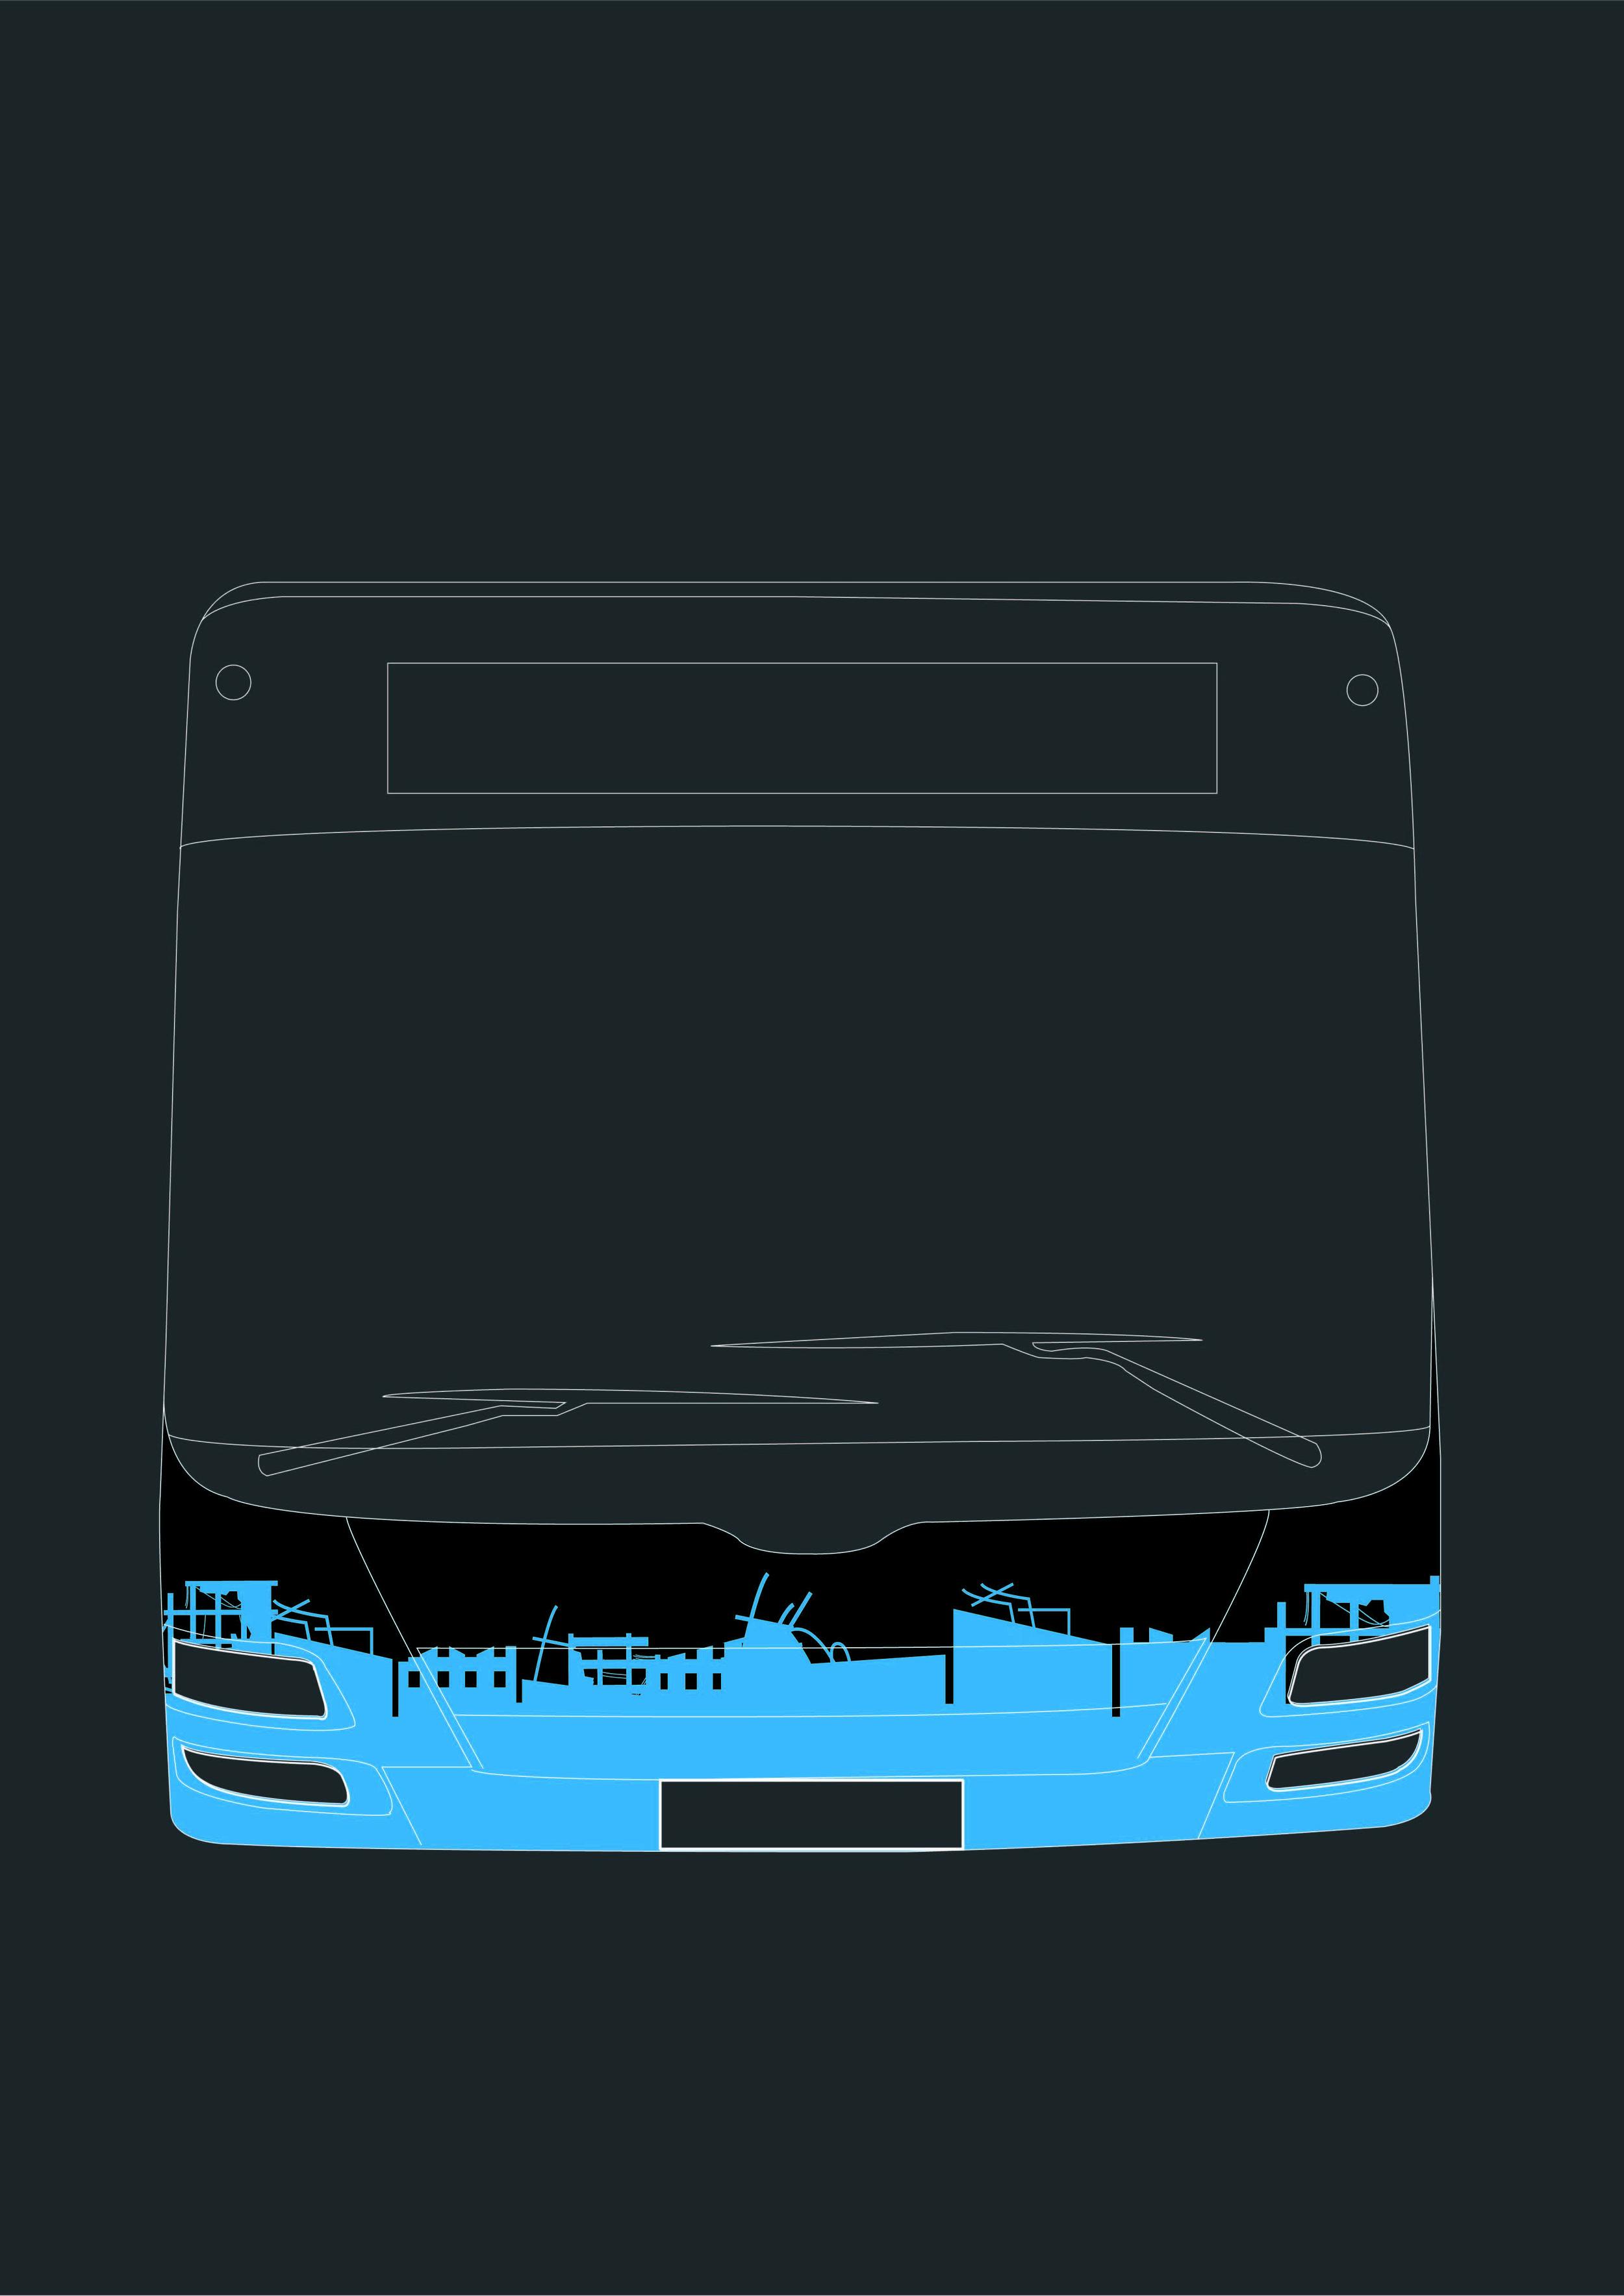 Bus_Visuel2_front.jpg